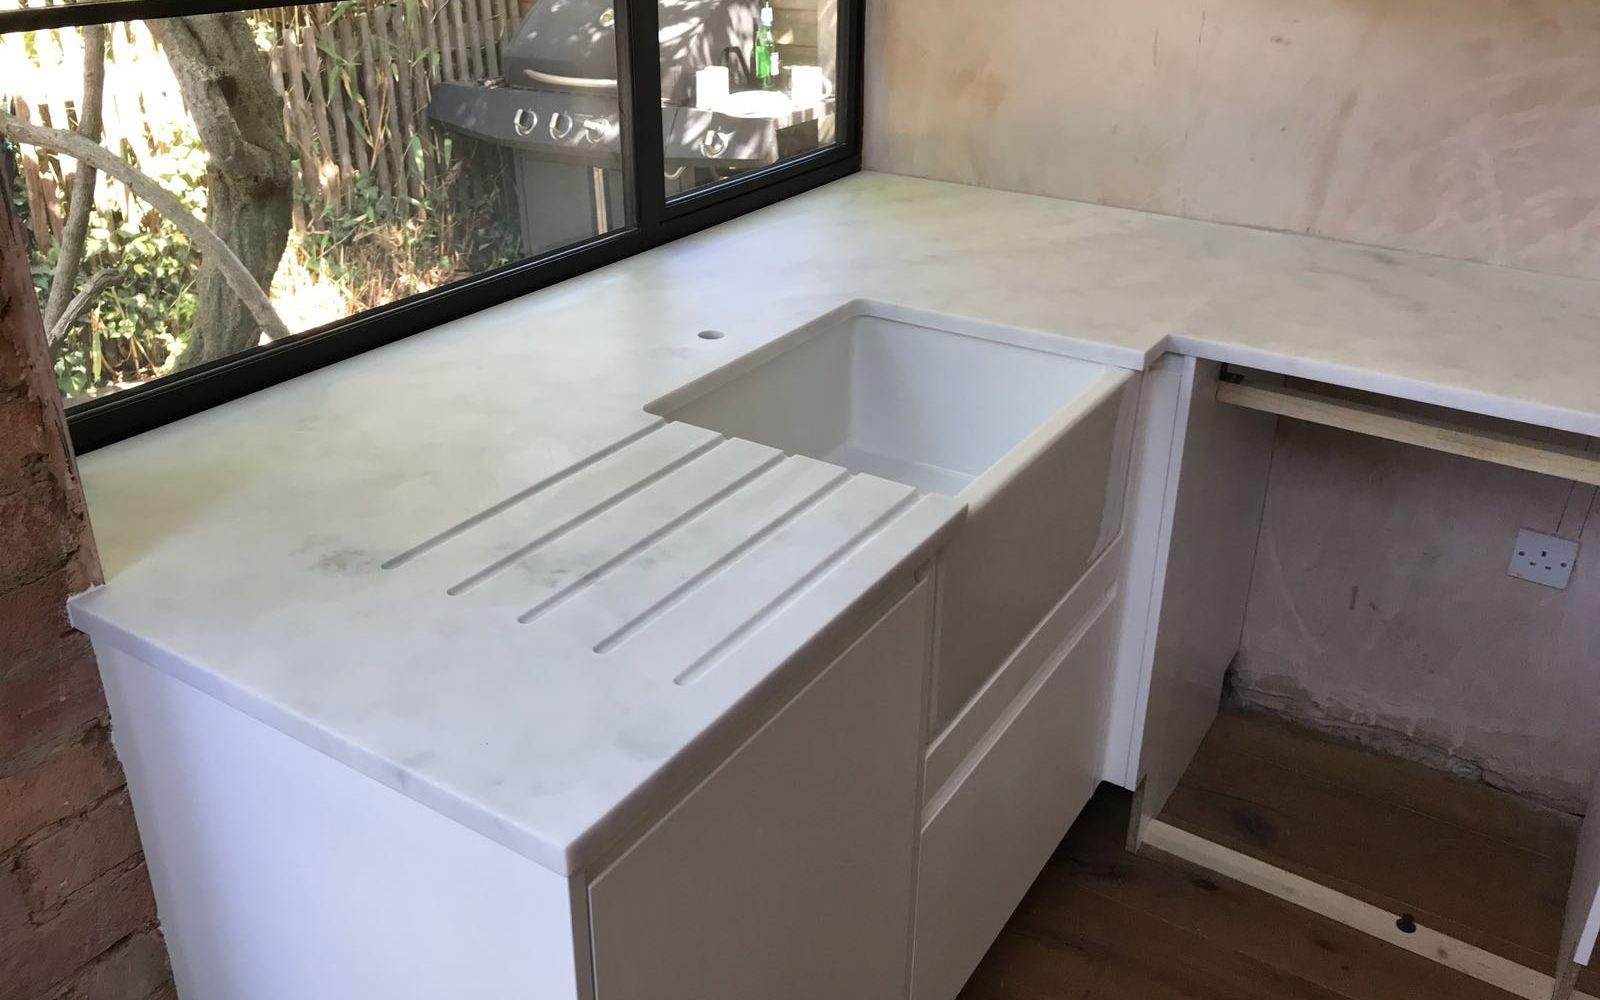 Carrara White, Loughton, August 2018